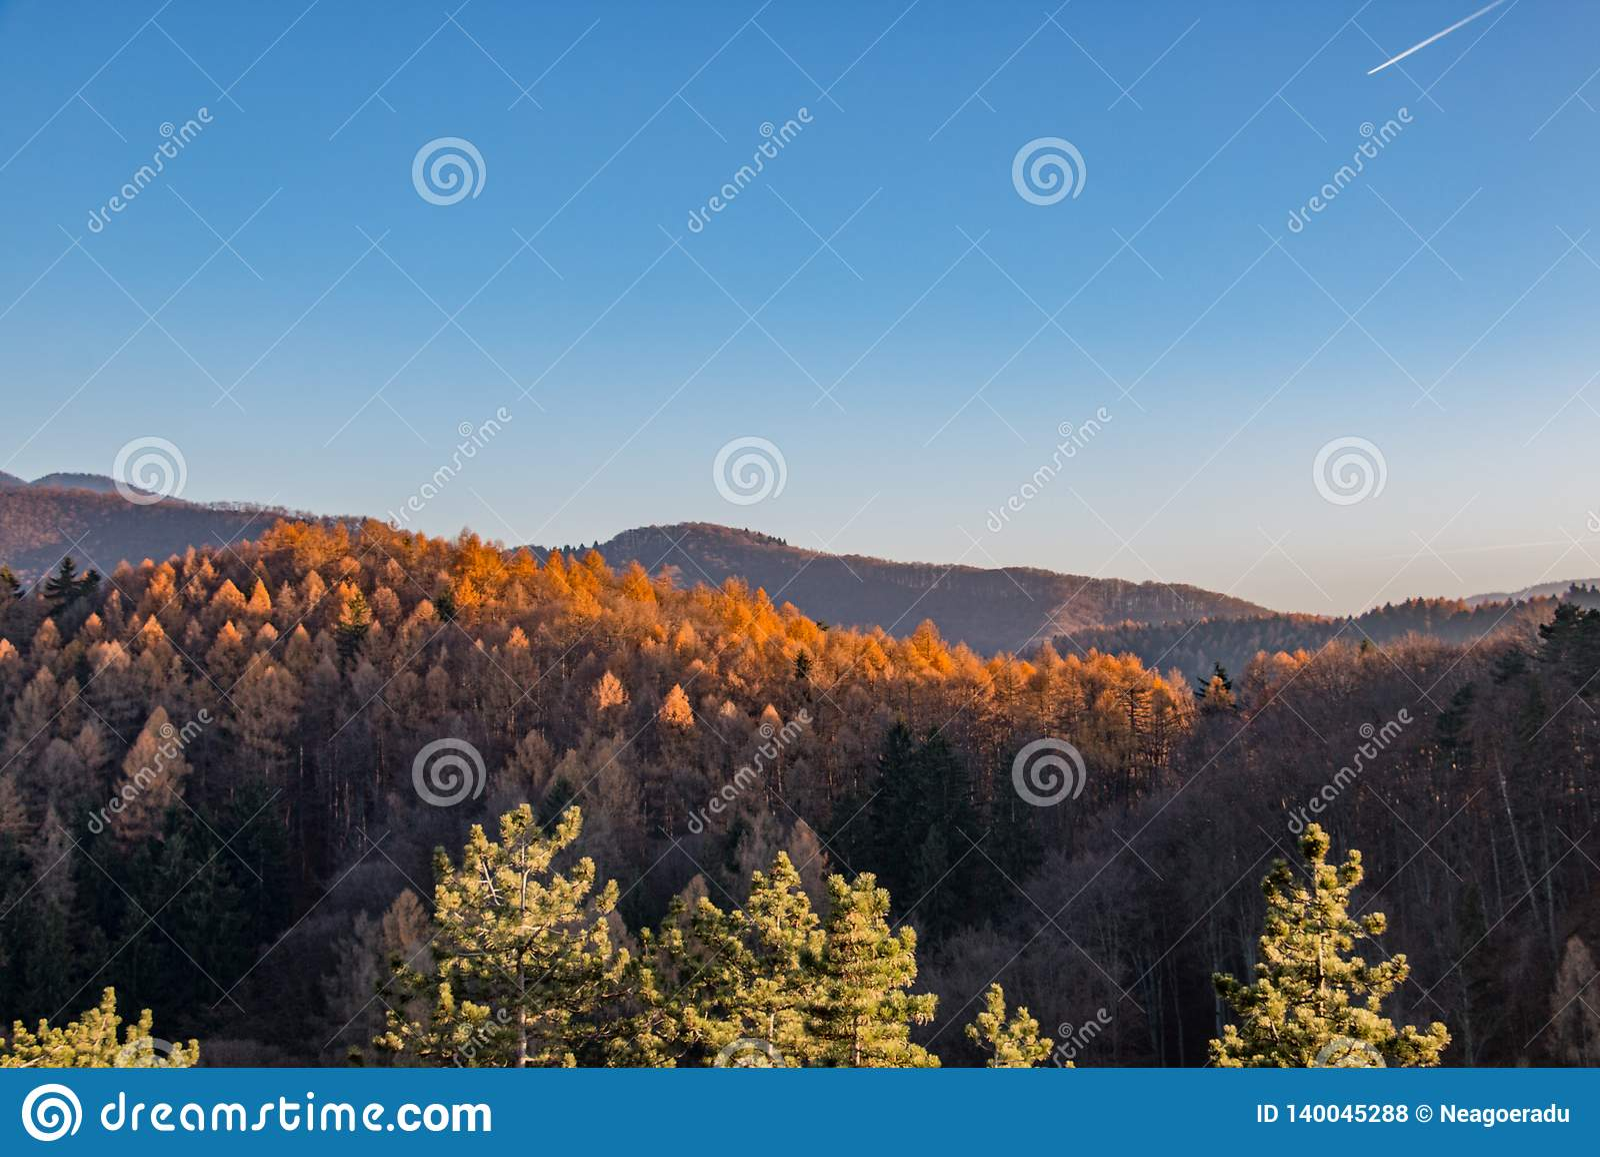 Summer mountains landscape in Transylvania, Romania